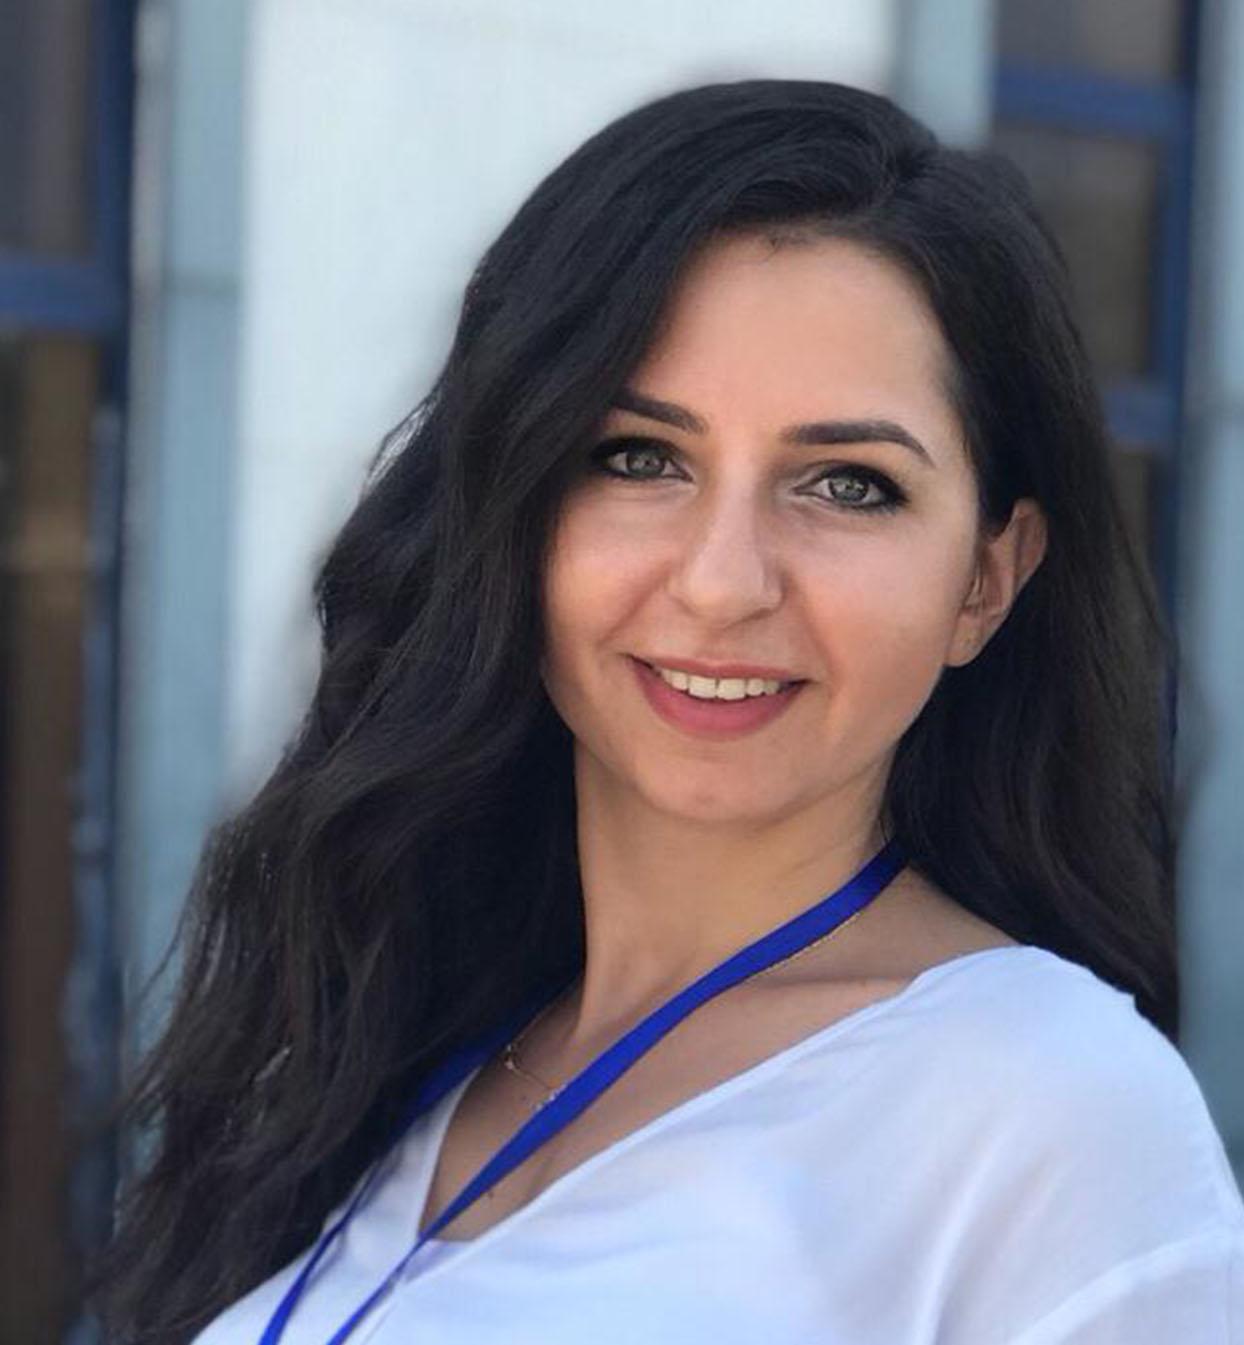 Yara Mikael